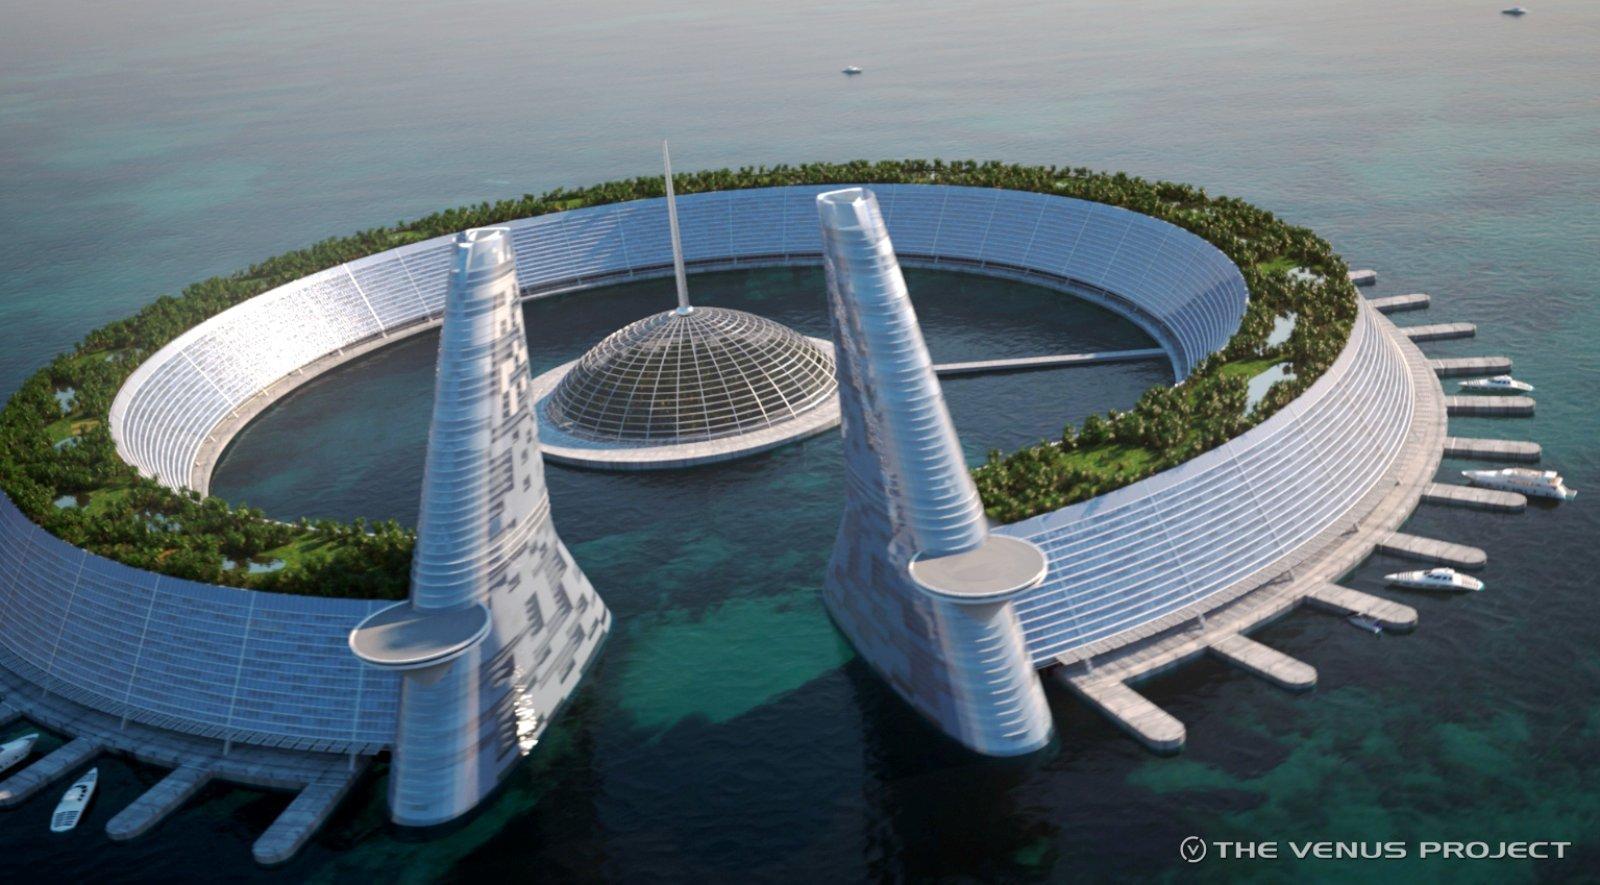 Circular Ocean Community (The Venus Project)